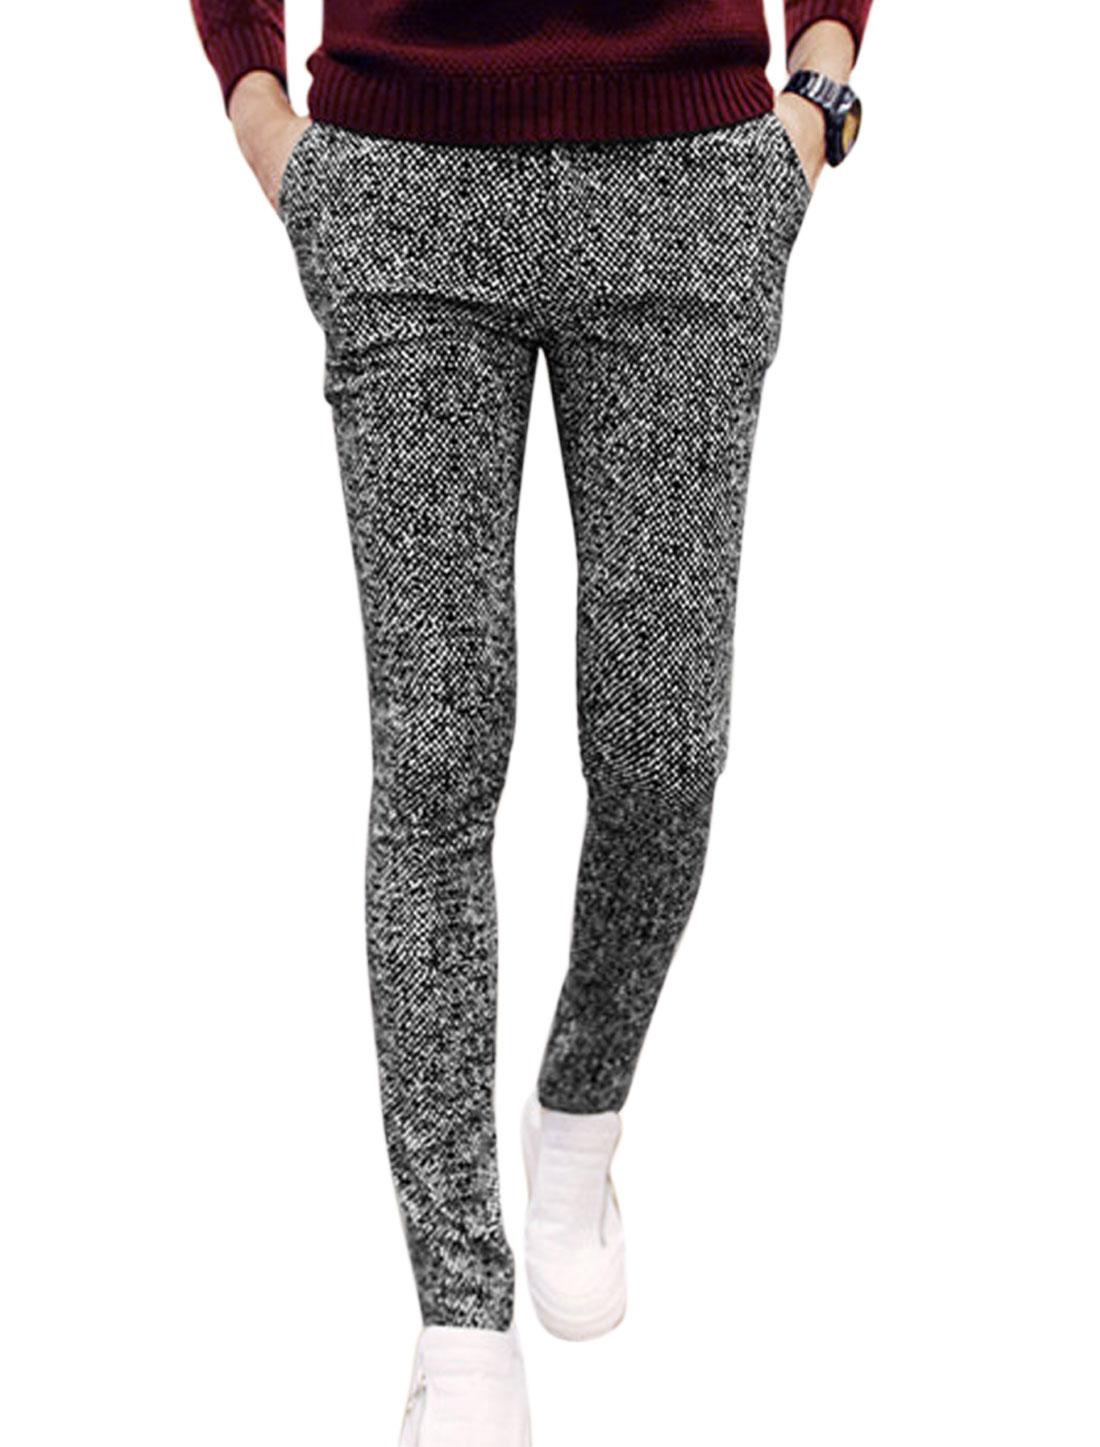 Men Dots Pattern Belt Loop Buttoned Zip Fly Casual Pants Black White W30